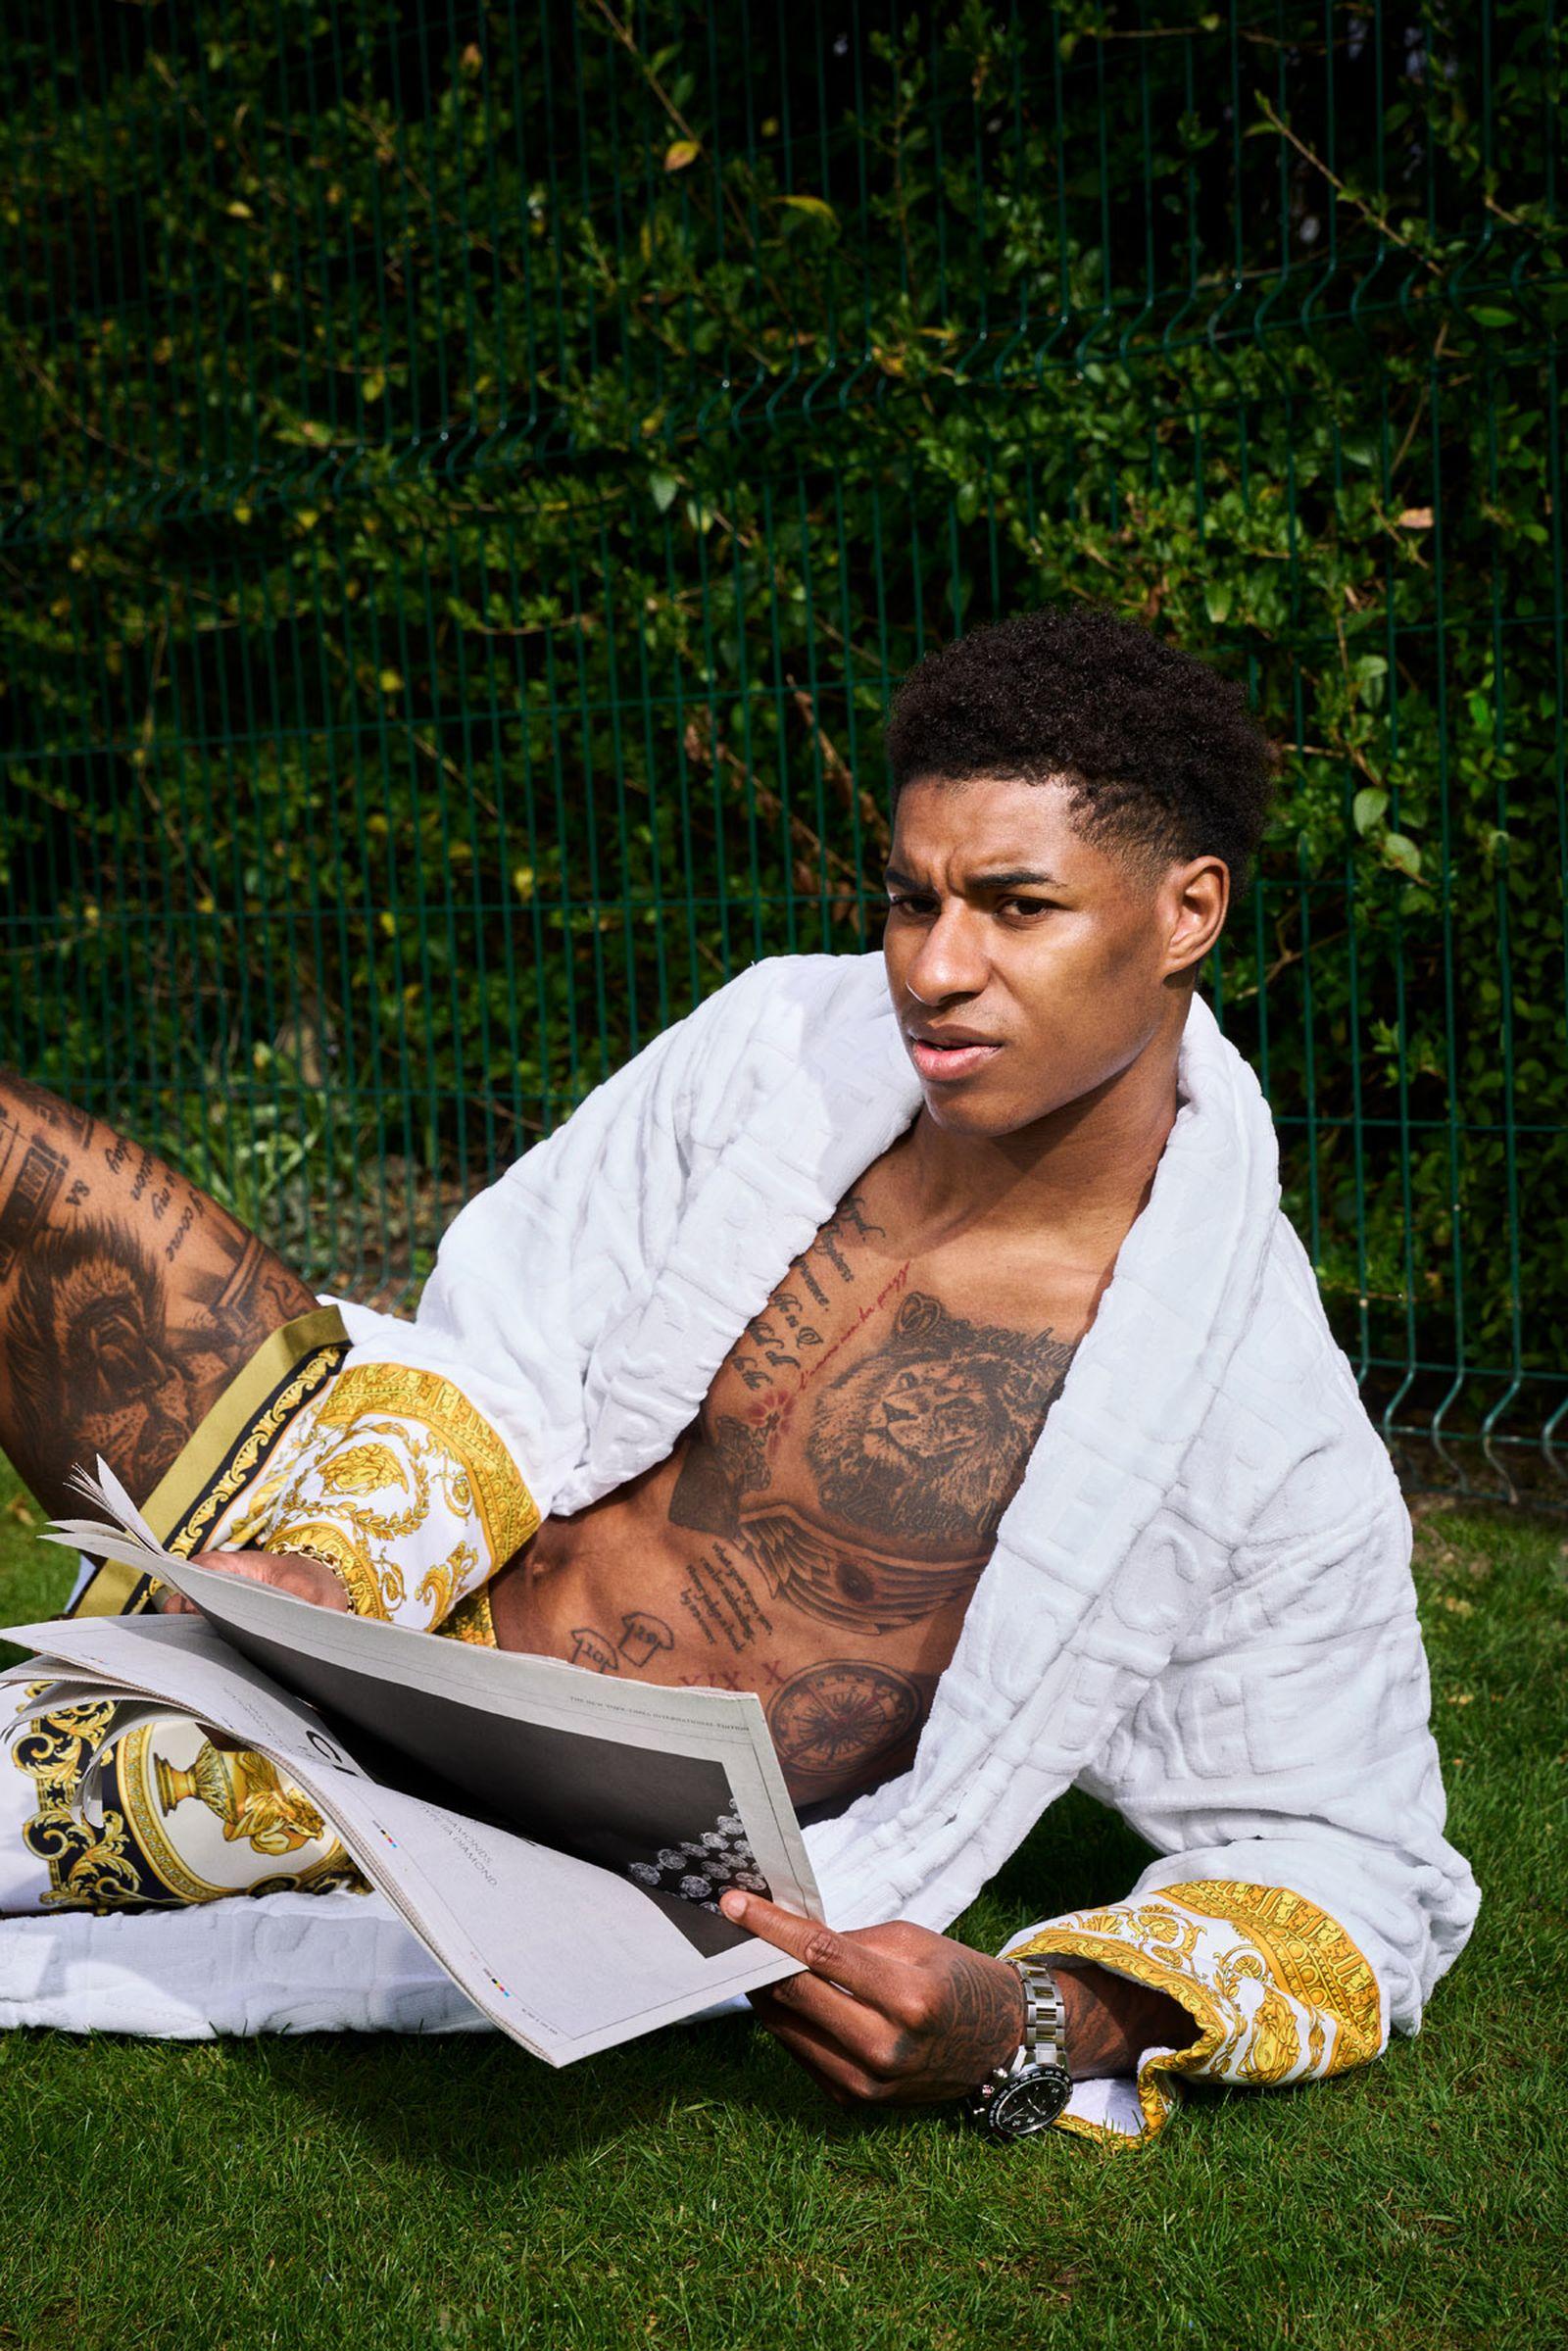 Robe VERSACE Boxers VERSACE Watch TAG HEUER